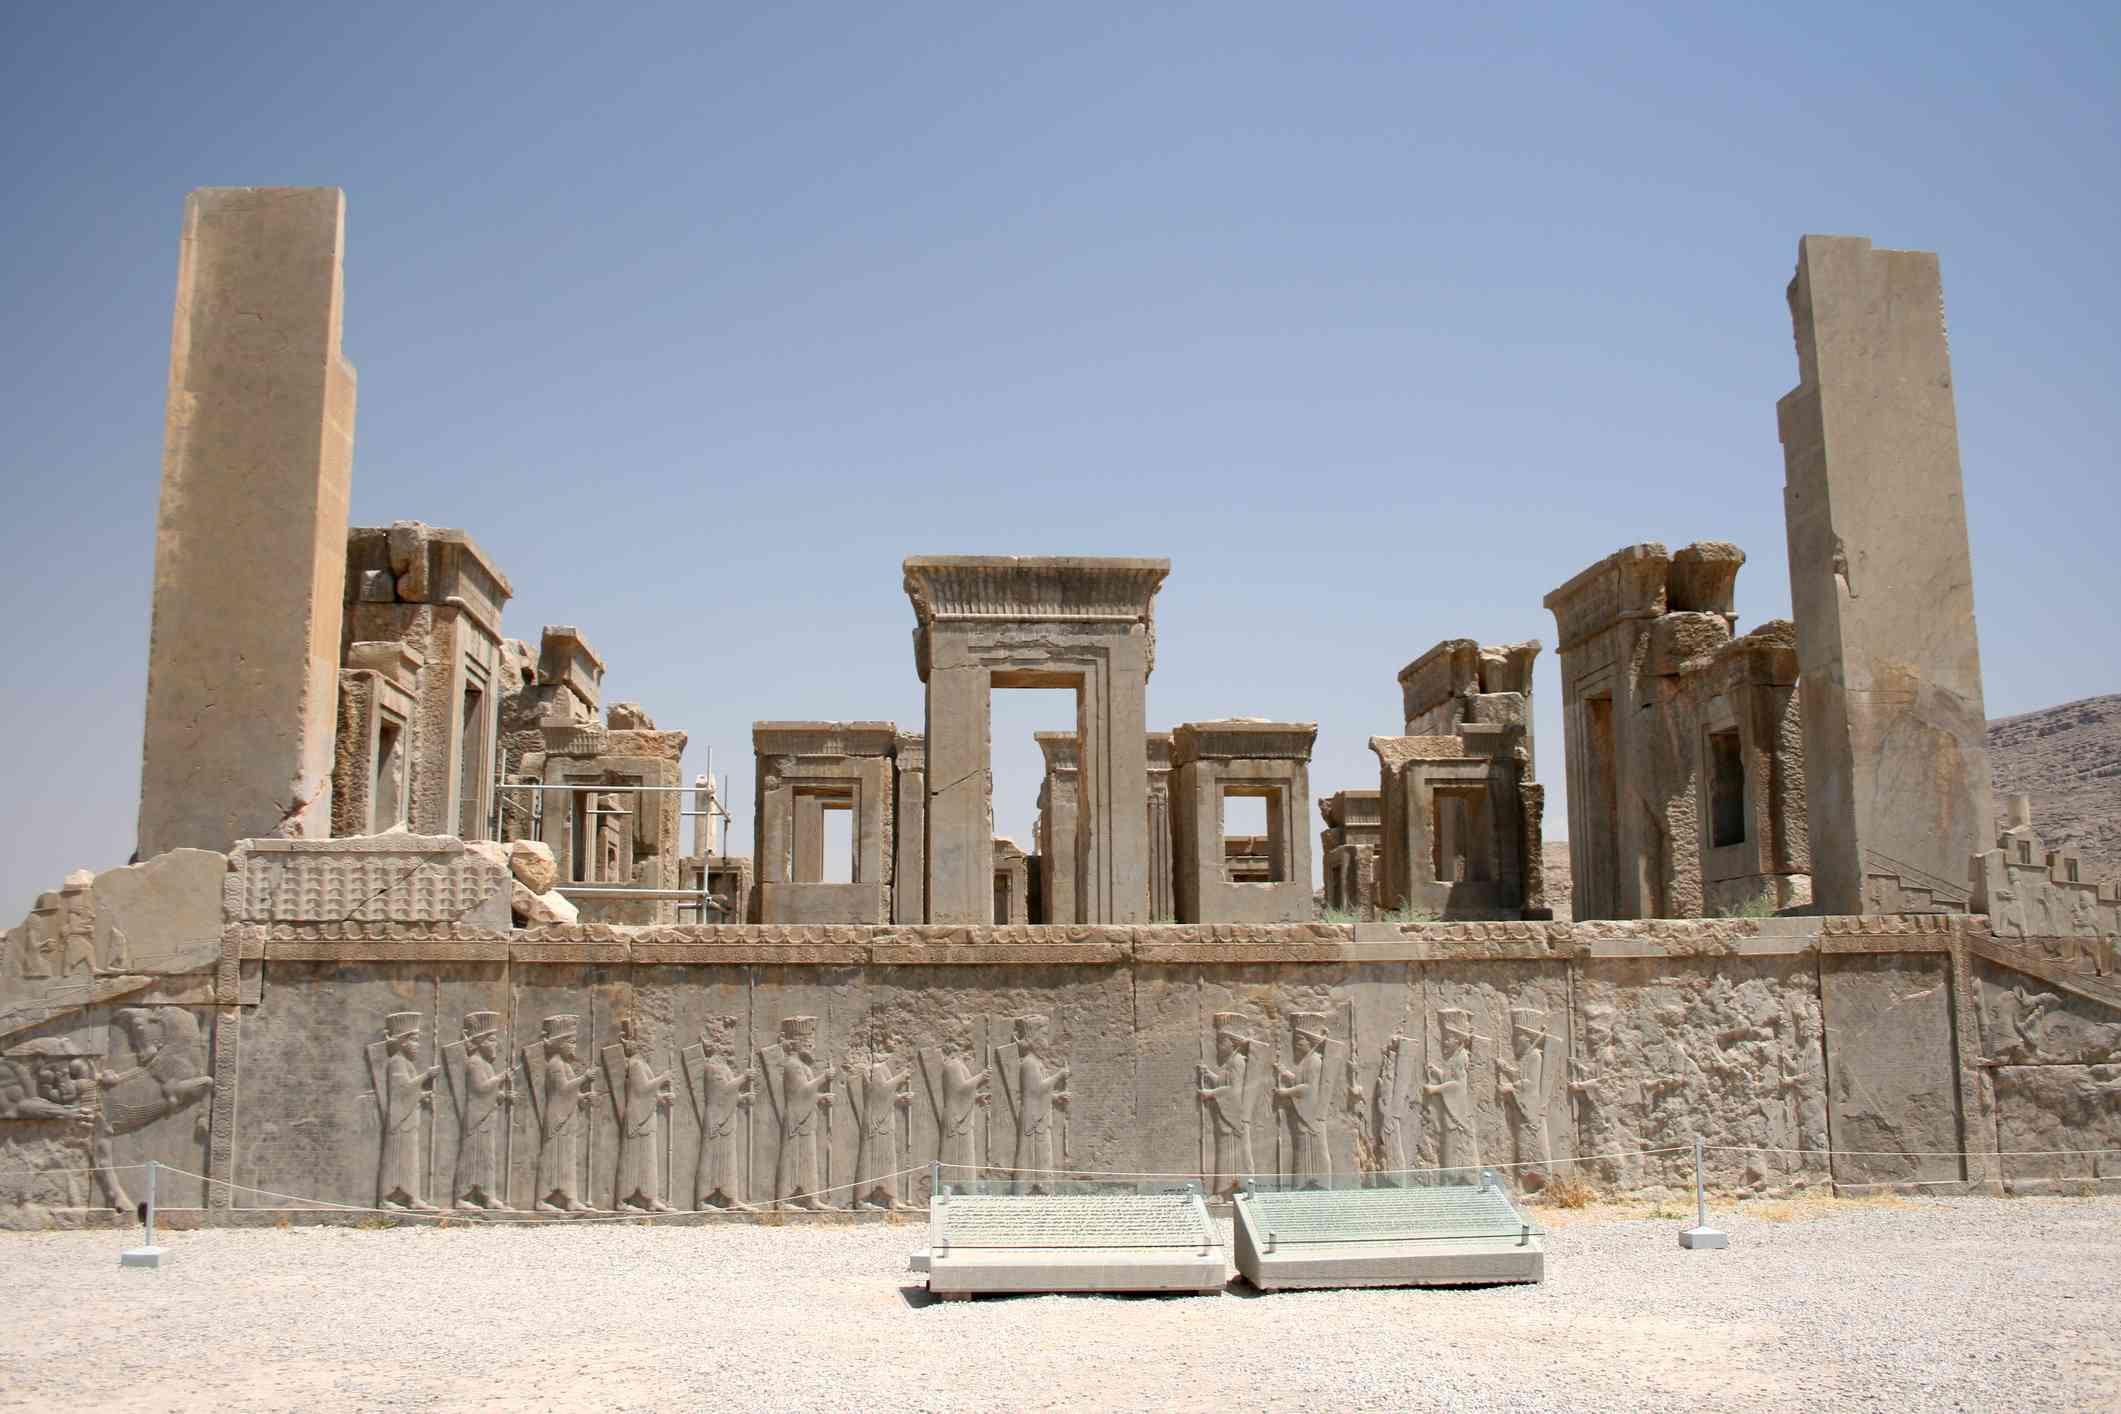 Palace of Xerxes, Persepolis